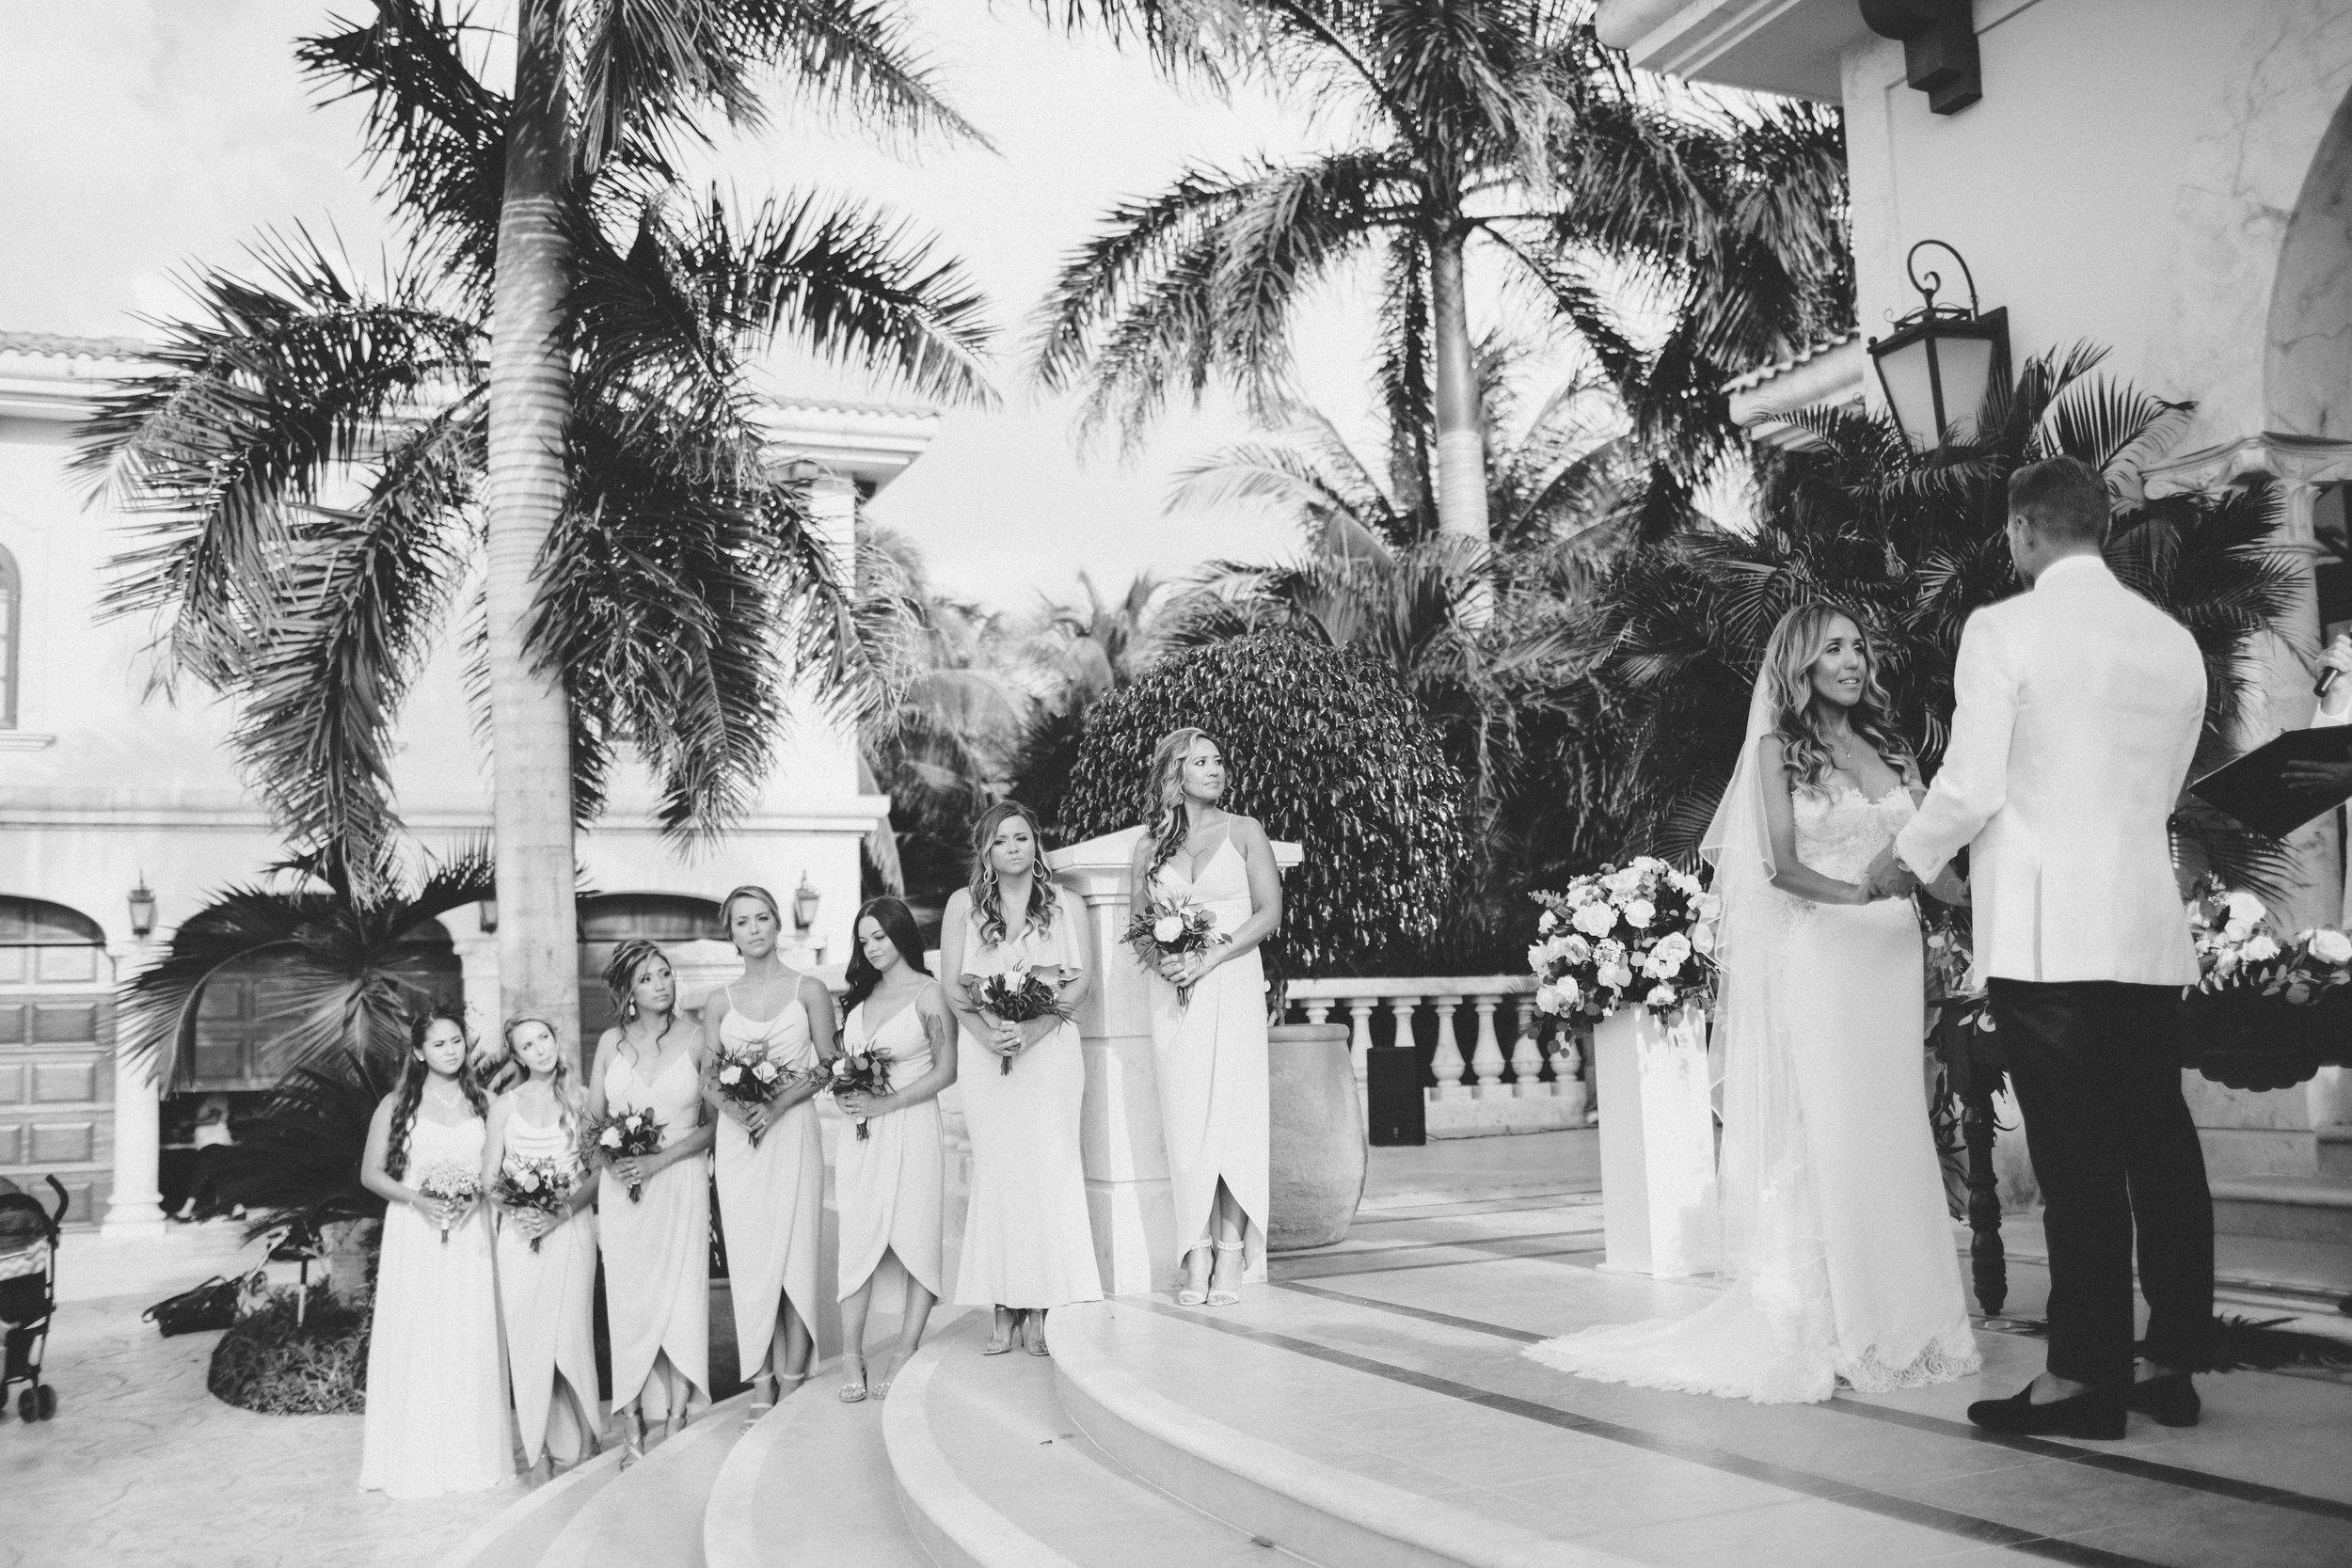 mexico_wedding_cancun_villa_la_joya_evangeline_lane_058a.jpg